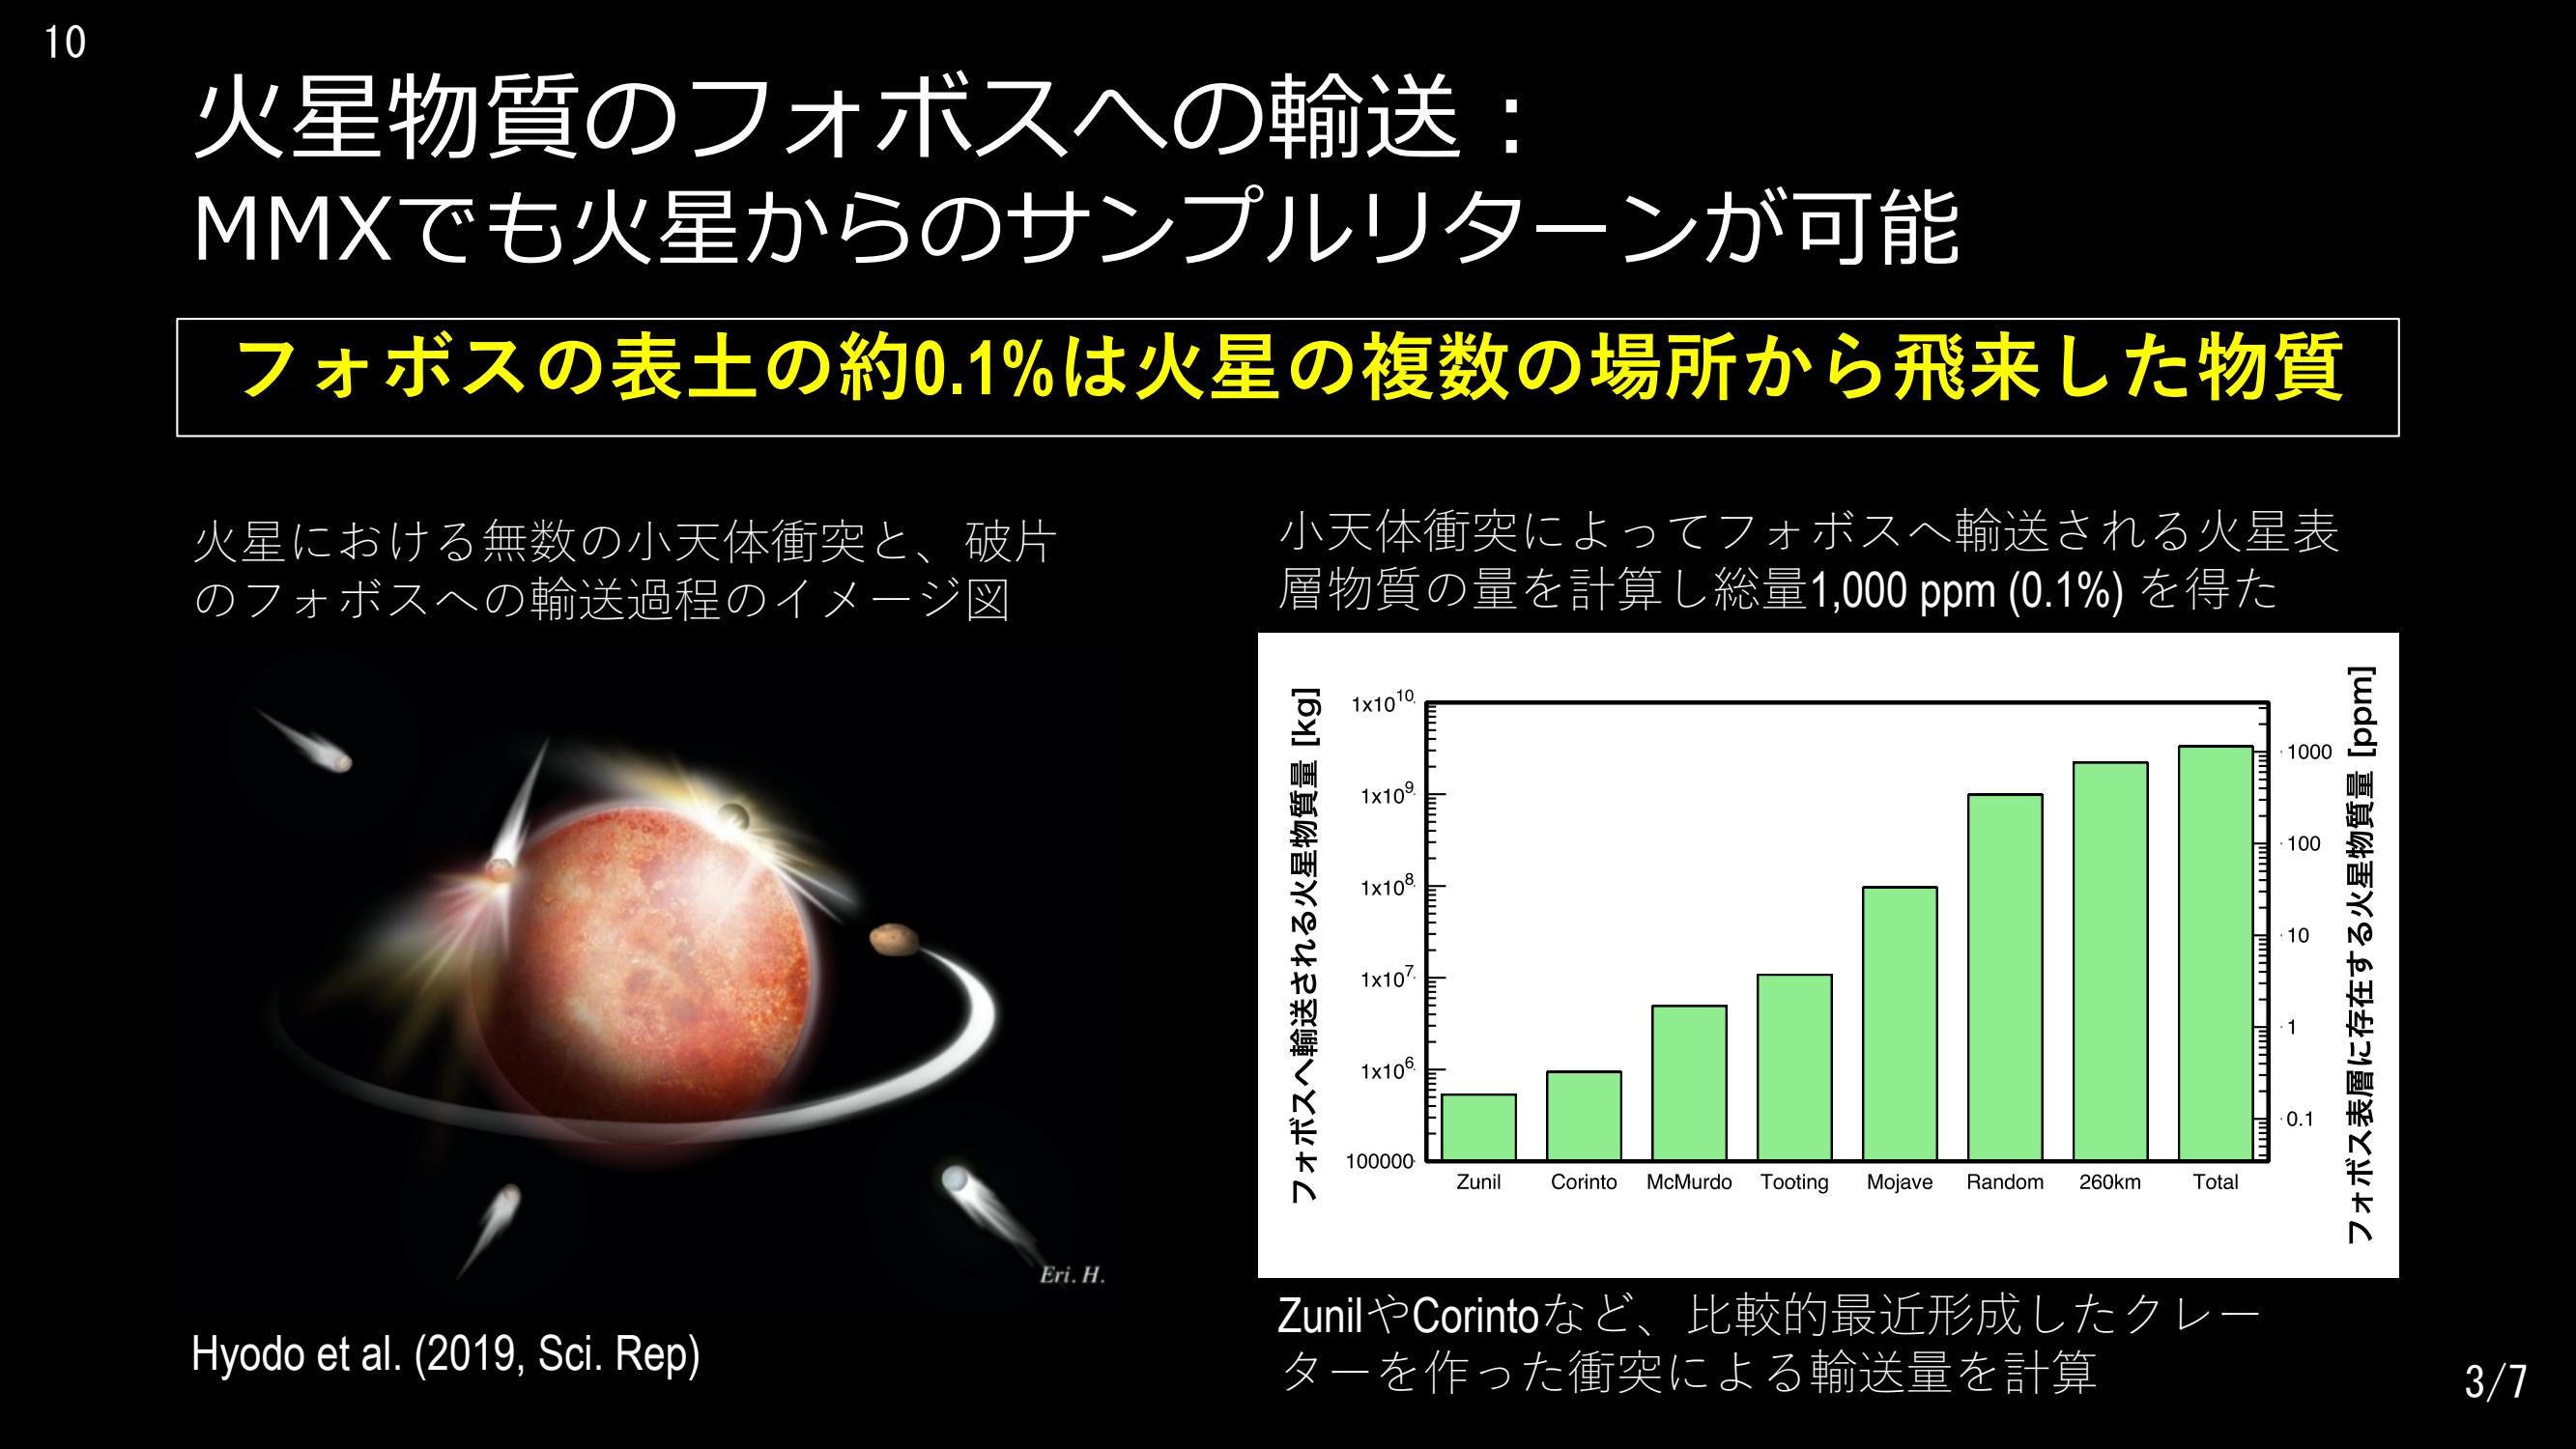 f:id:Imamura:20210819095455p:plain